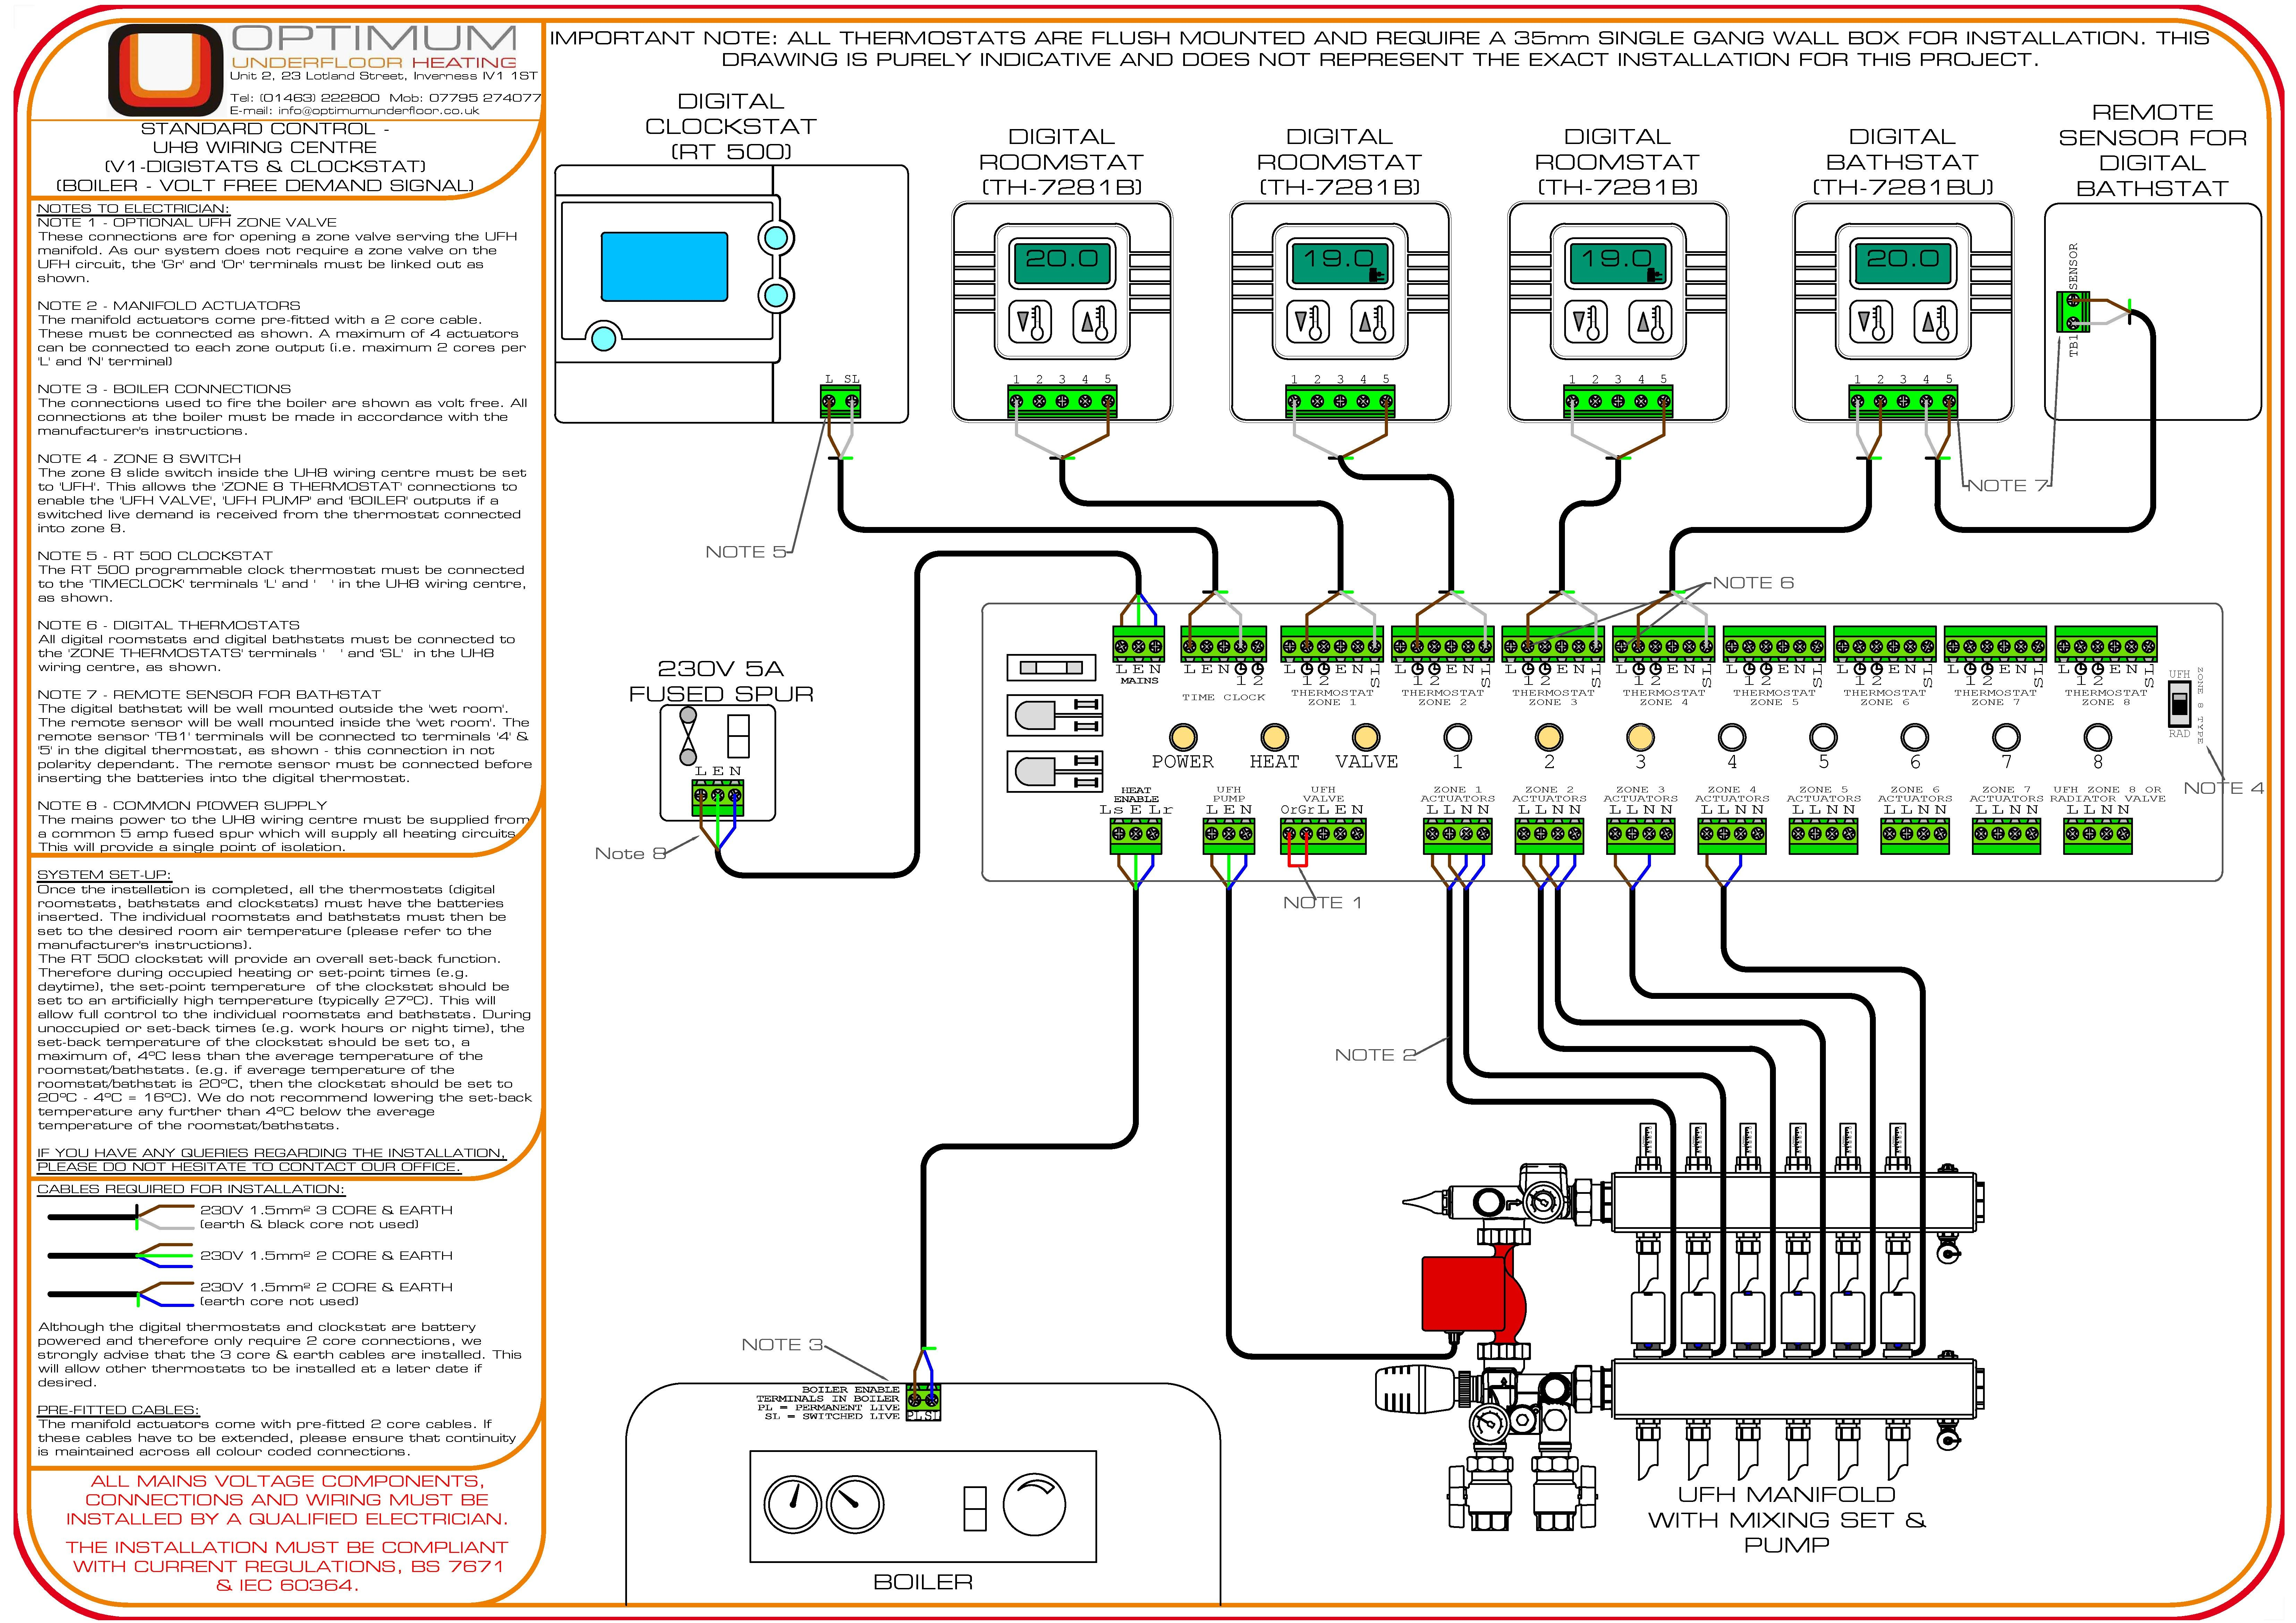 medium resolution of wiring diagram for wet underfloor heating wiring diagram details underfloor heating wiring diagram free download wiring diagrams